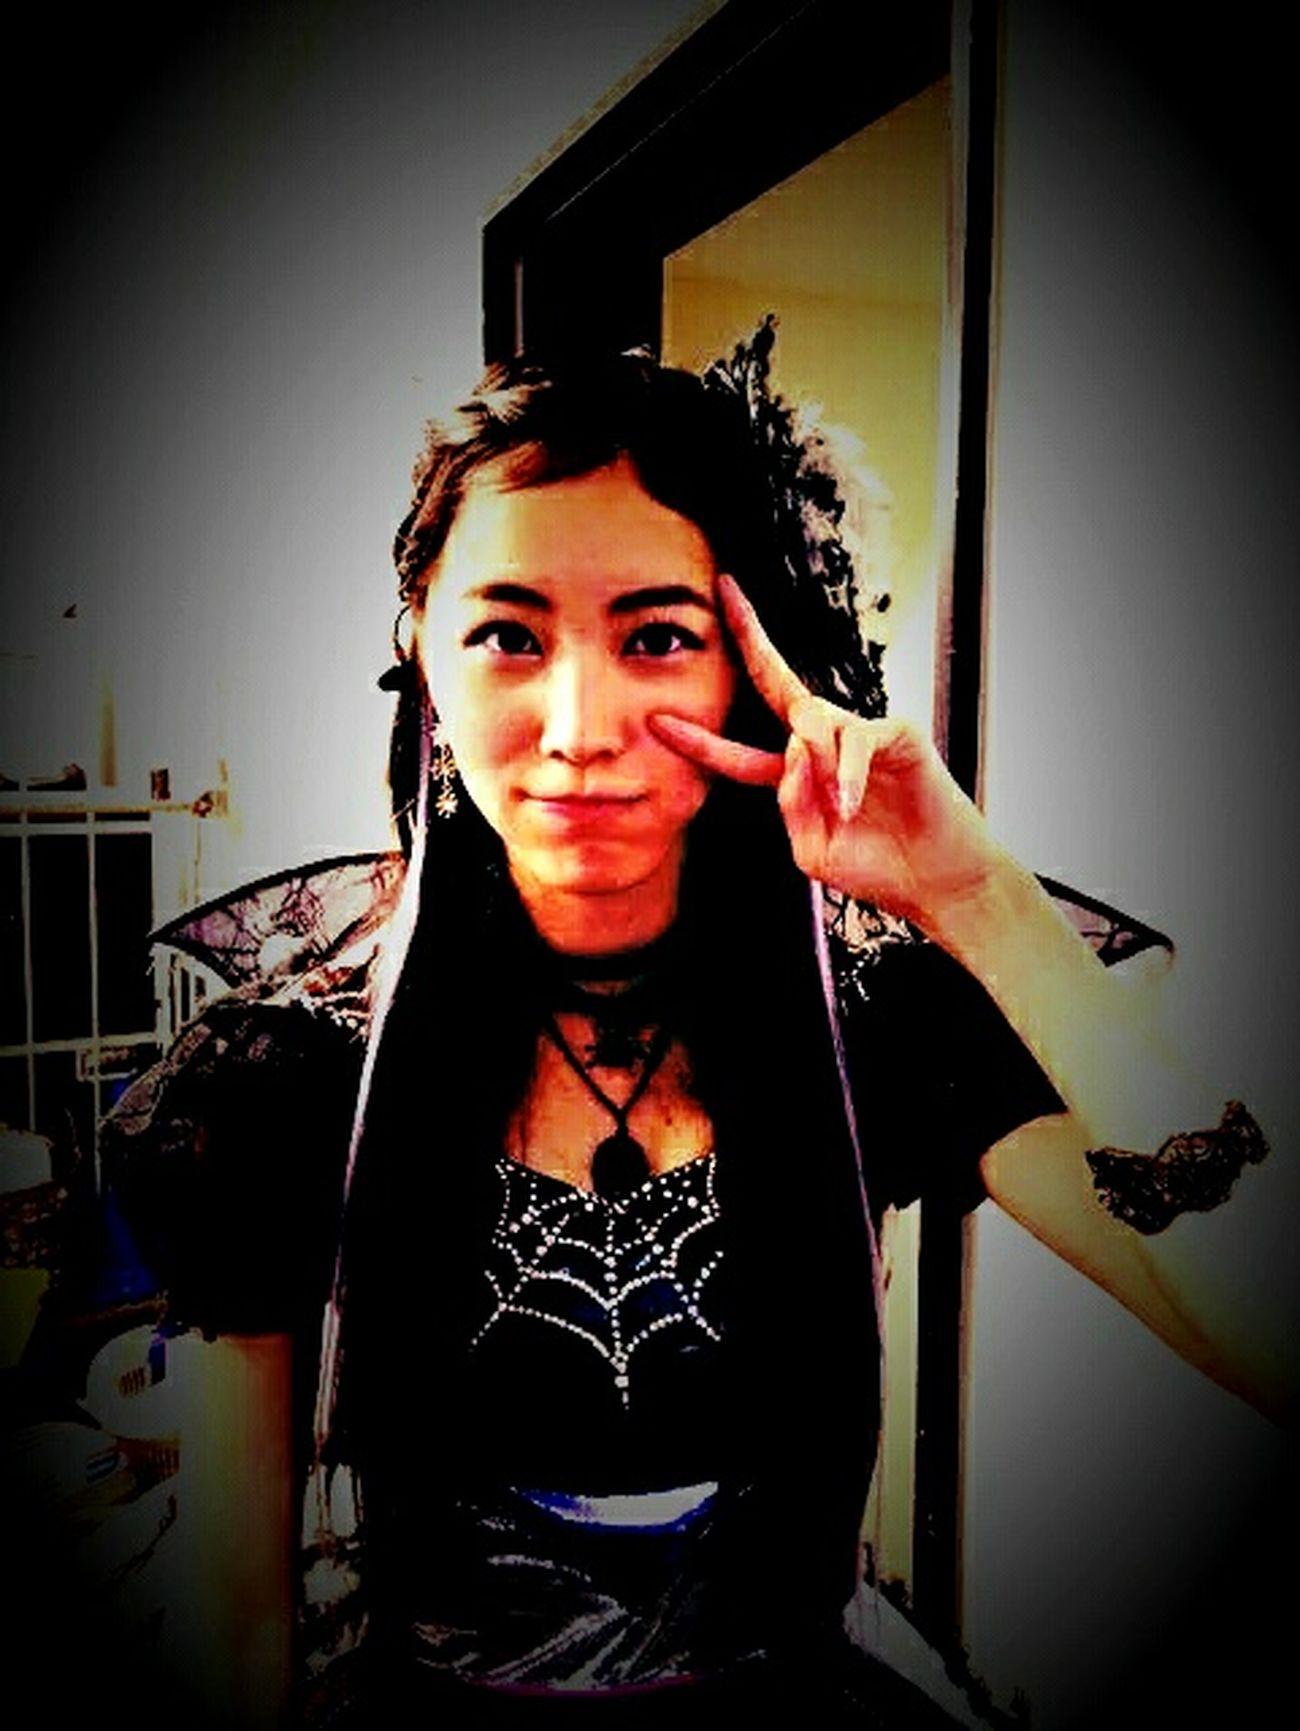 Kawaii *-* Beautiful Cute KAWAII 松井 AKB48 SKE48 Matsui Jurina Ske48ace Kirei Halloweennight